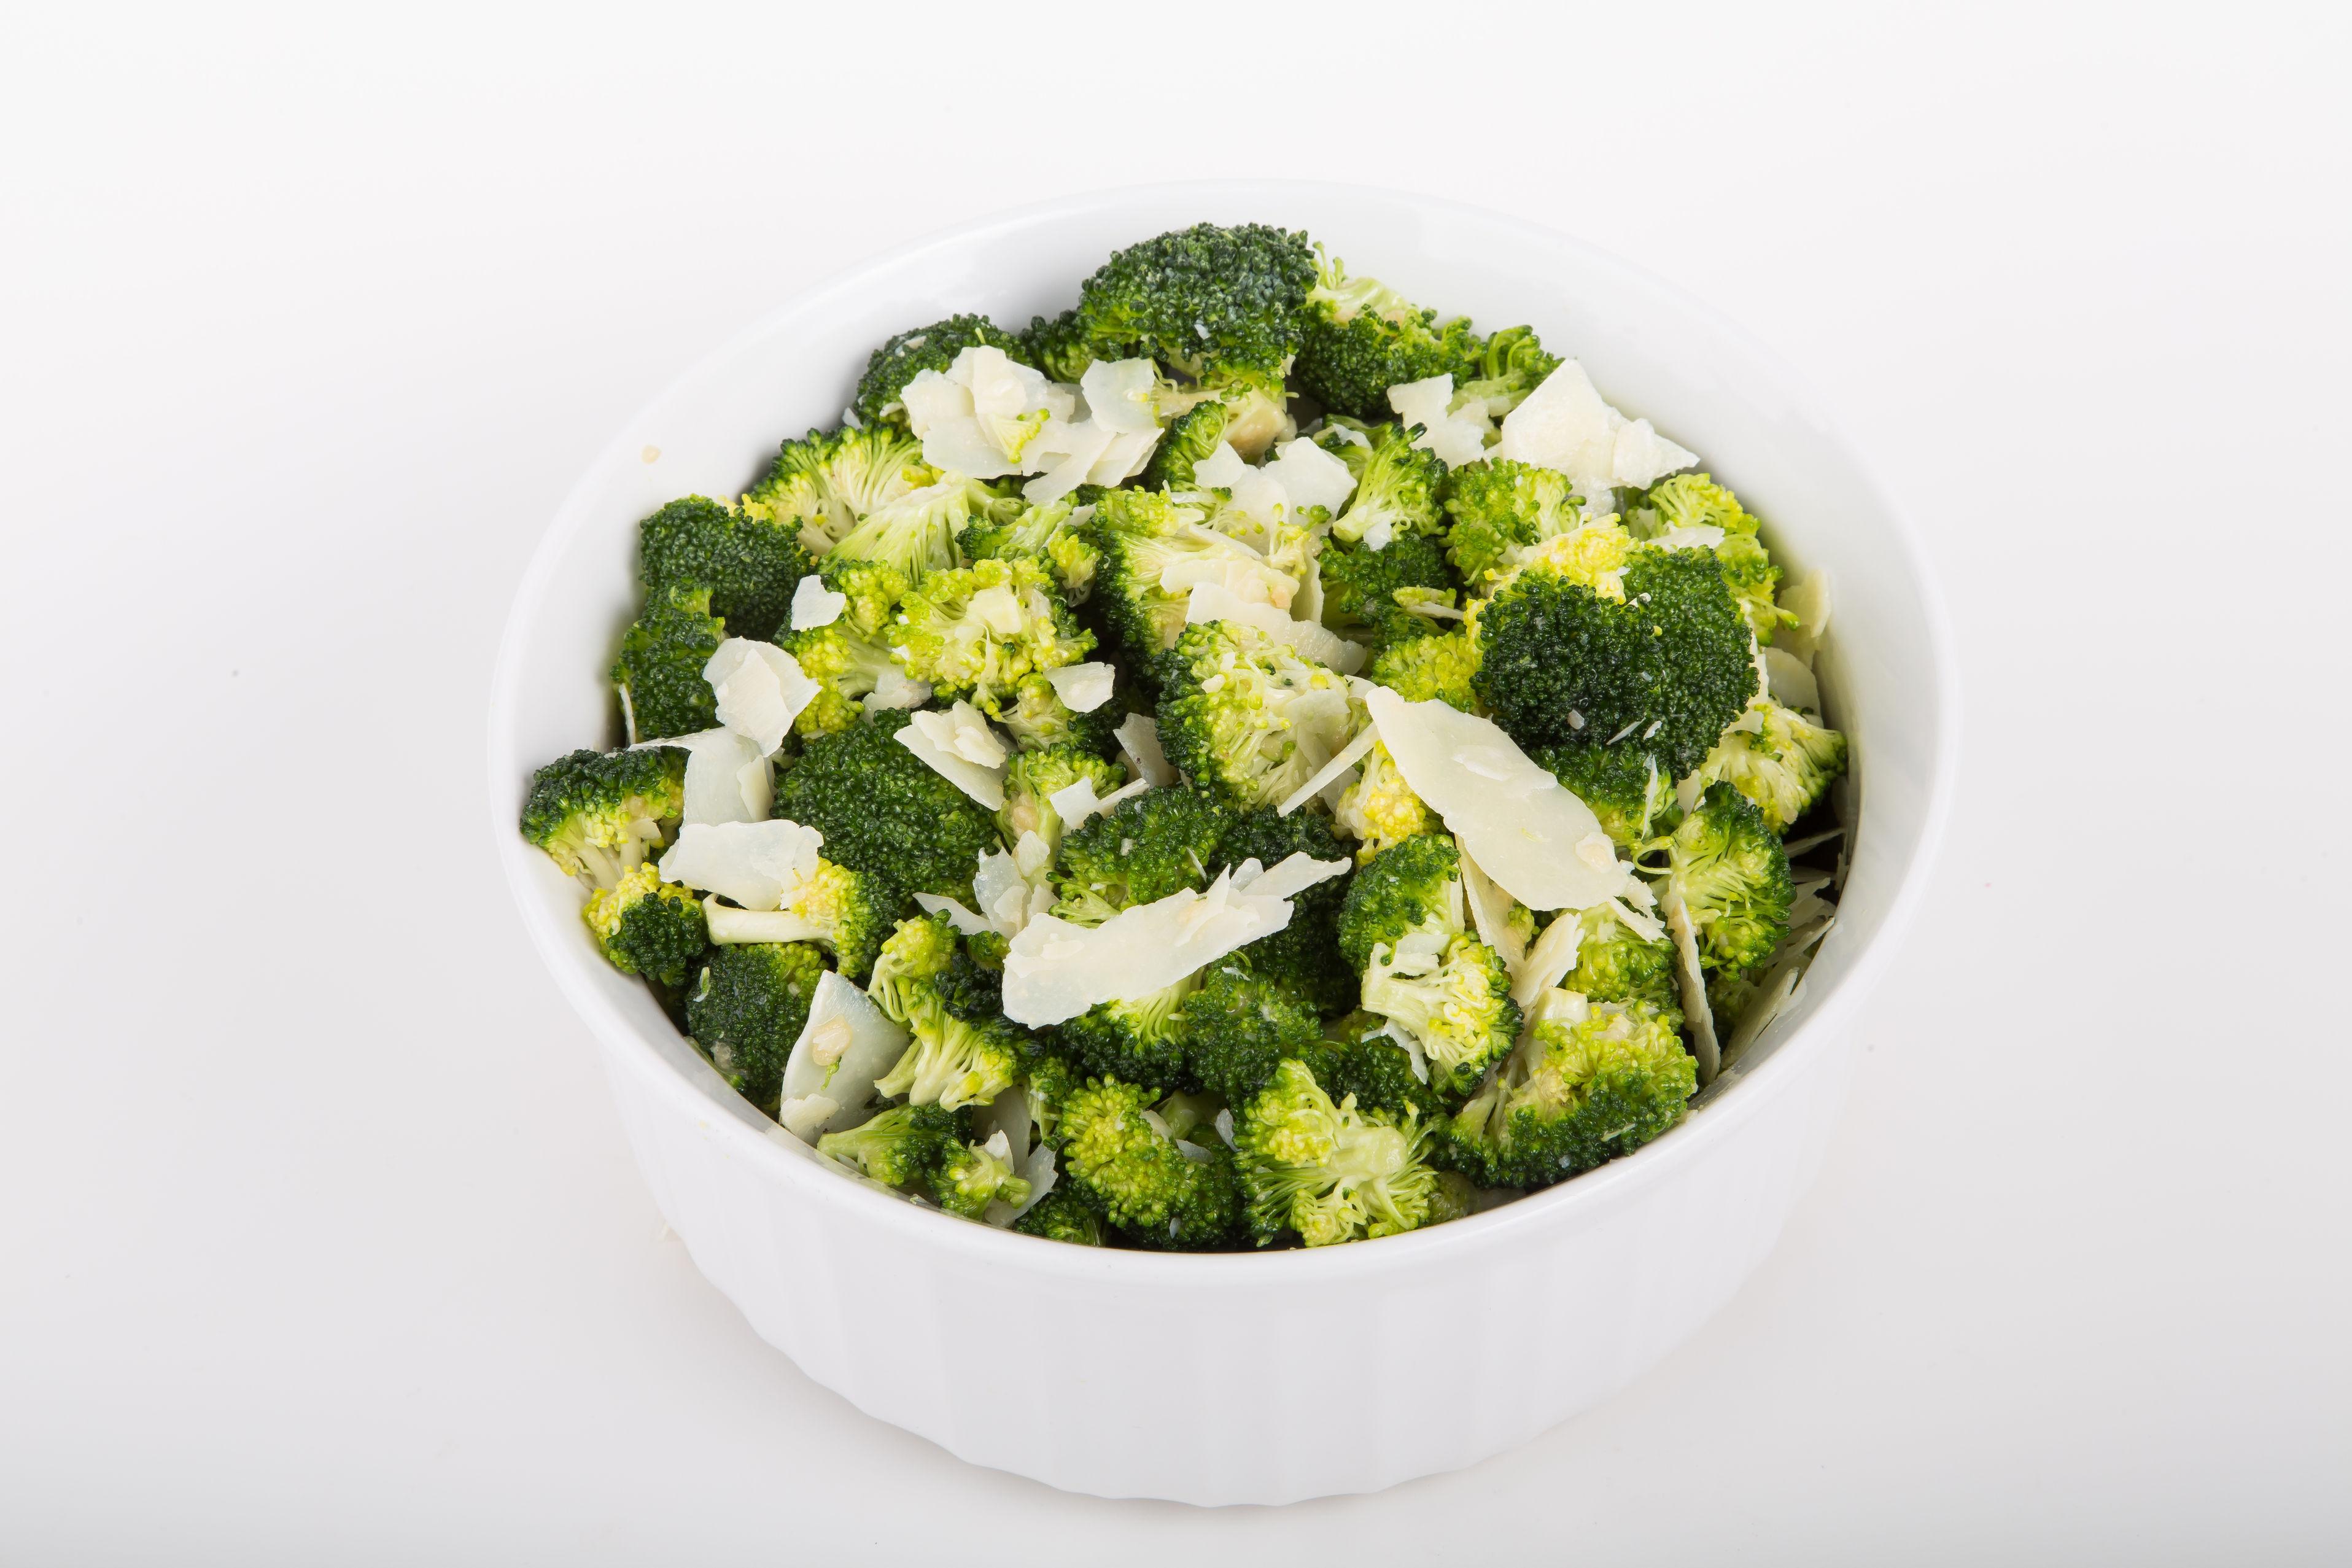 Simple Side Dish: Broccoli with Lemon & Parmesan - 12 Tomatoes